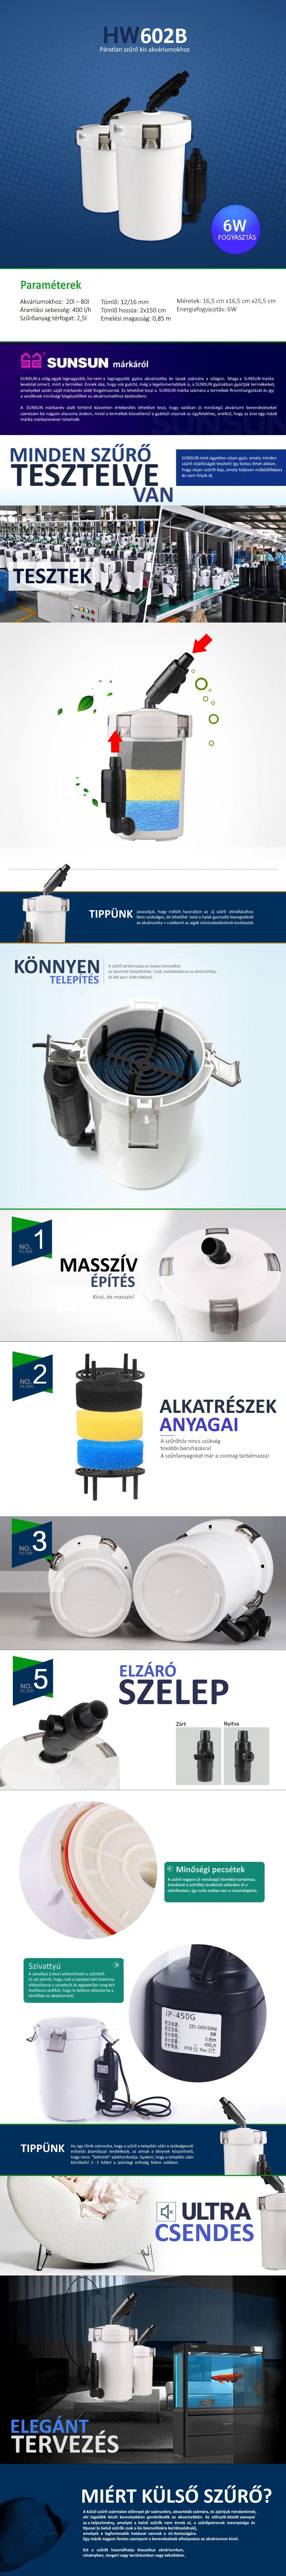 https://www.rostlinna-akvaria.cz/vupload/270364375.png